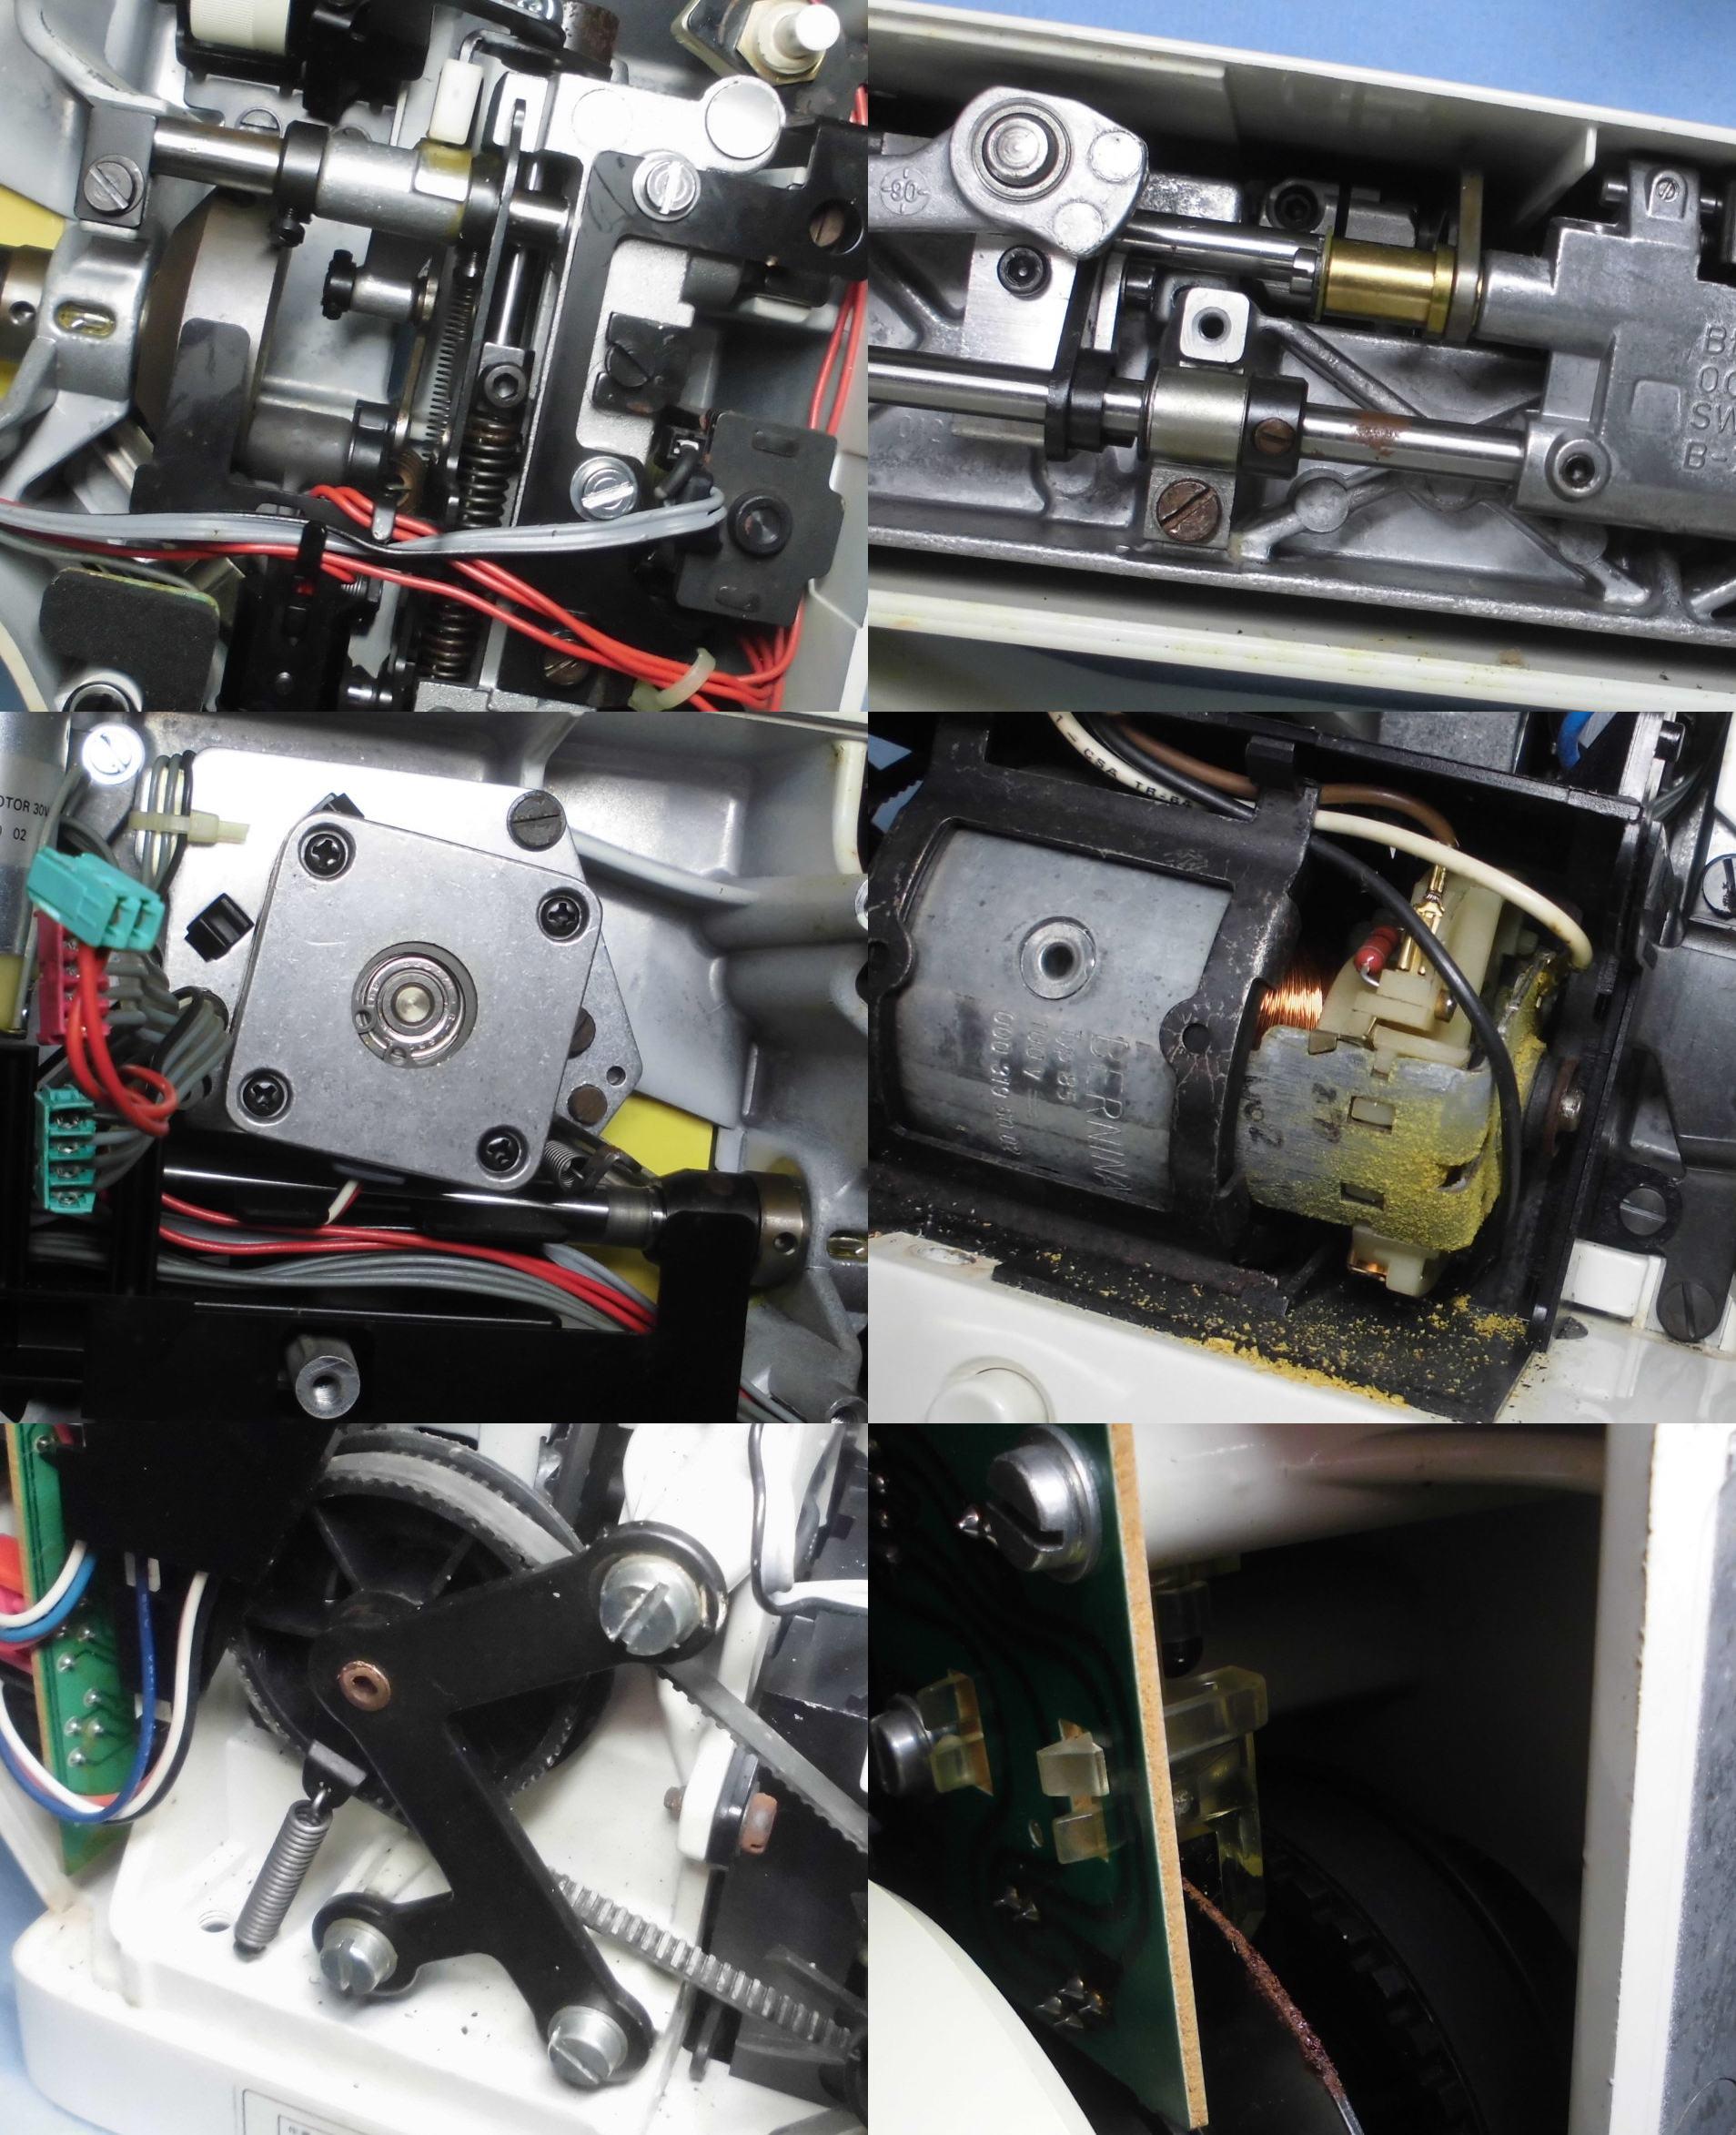 RCM1230の故障や不具合 布が前に進まない、返し縫いしない、動かない、縫えない